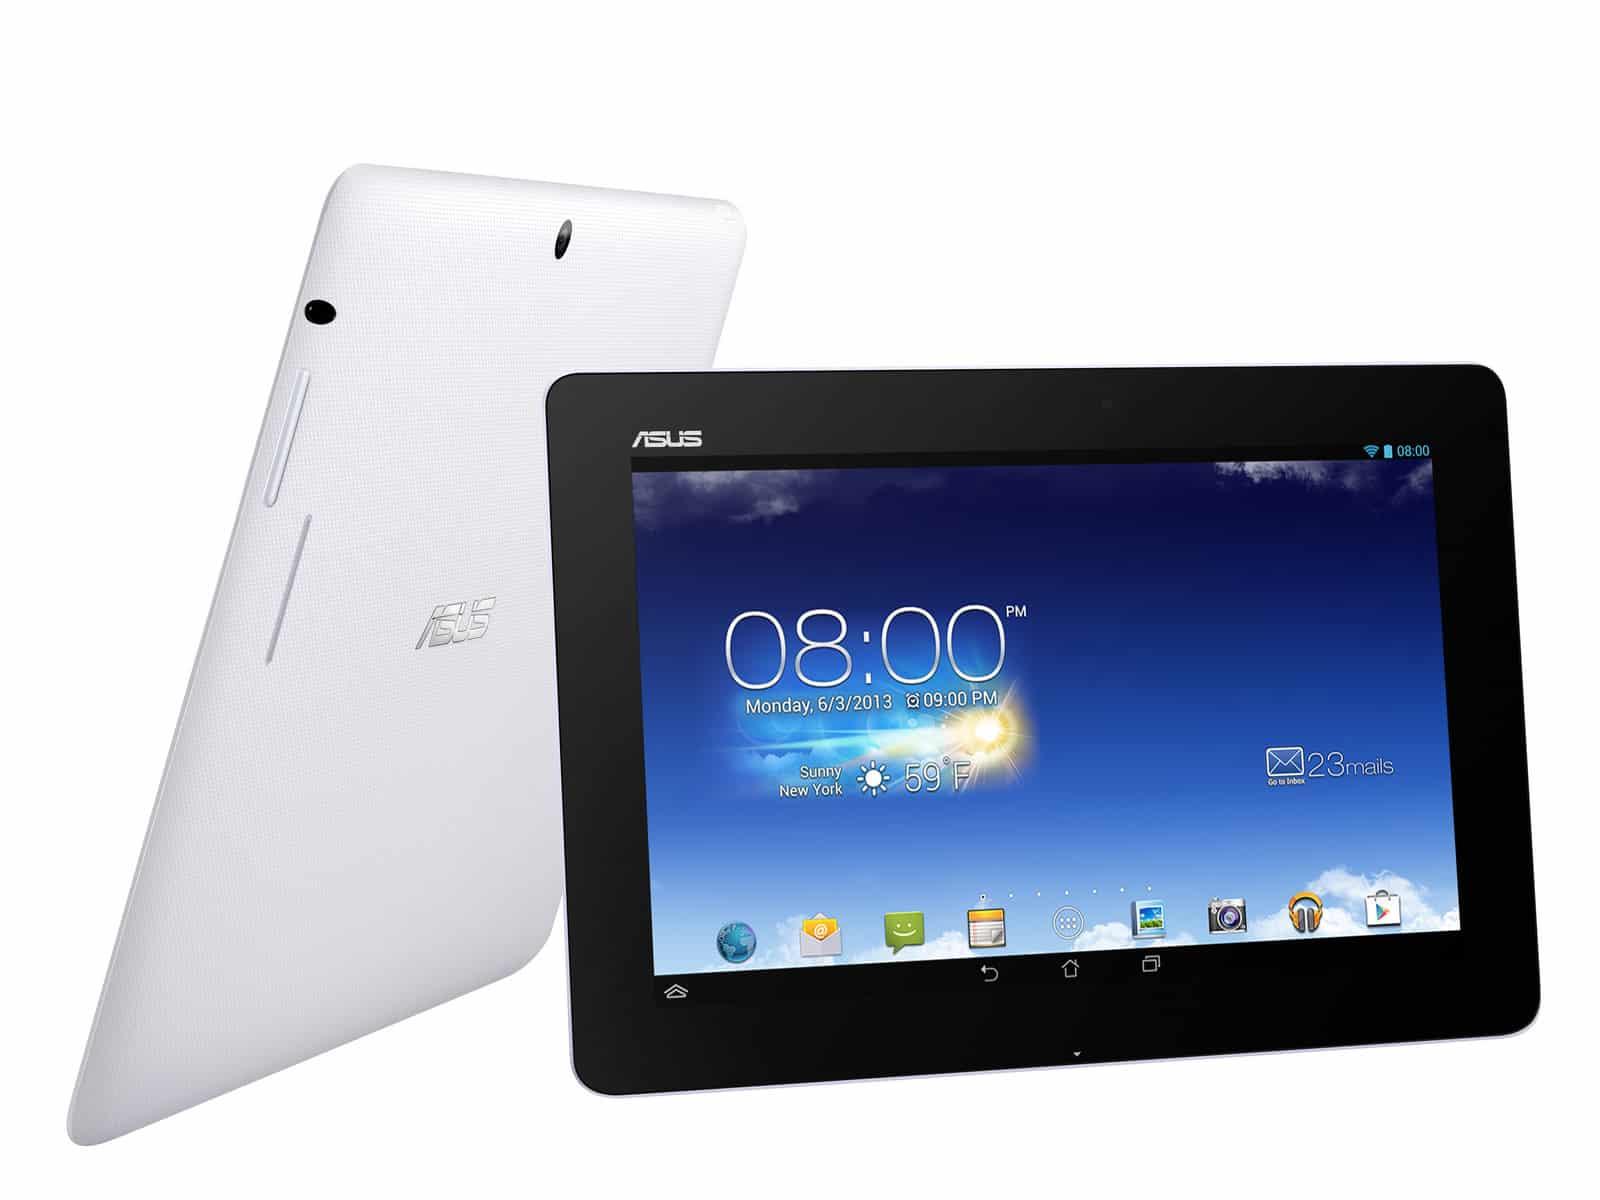 How to Flash Asus Memo Pad FHD10 Firmware using Intel Phone Flash Tool